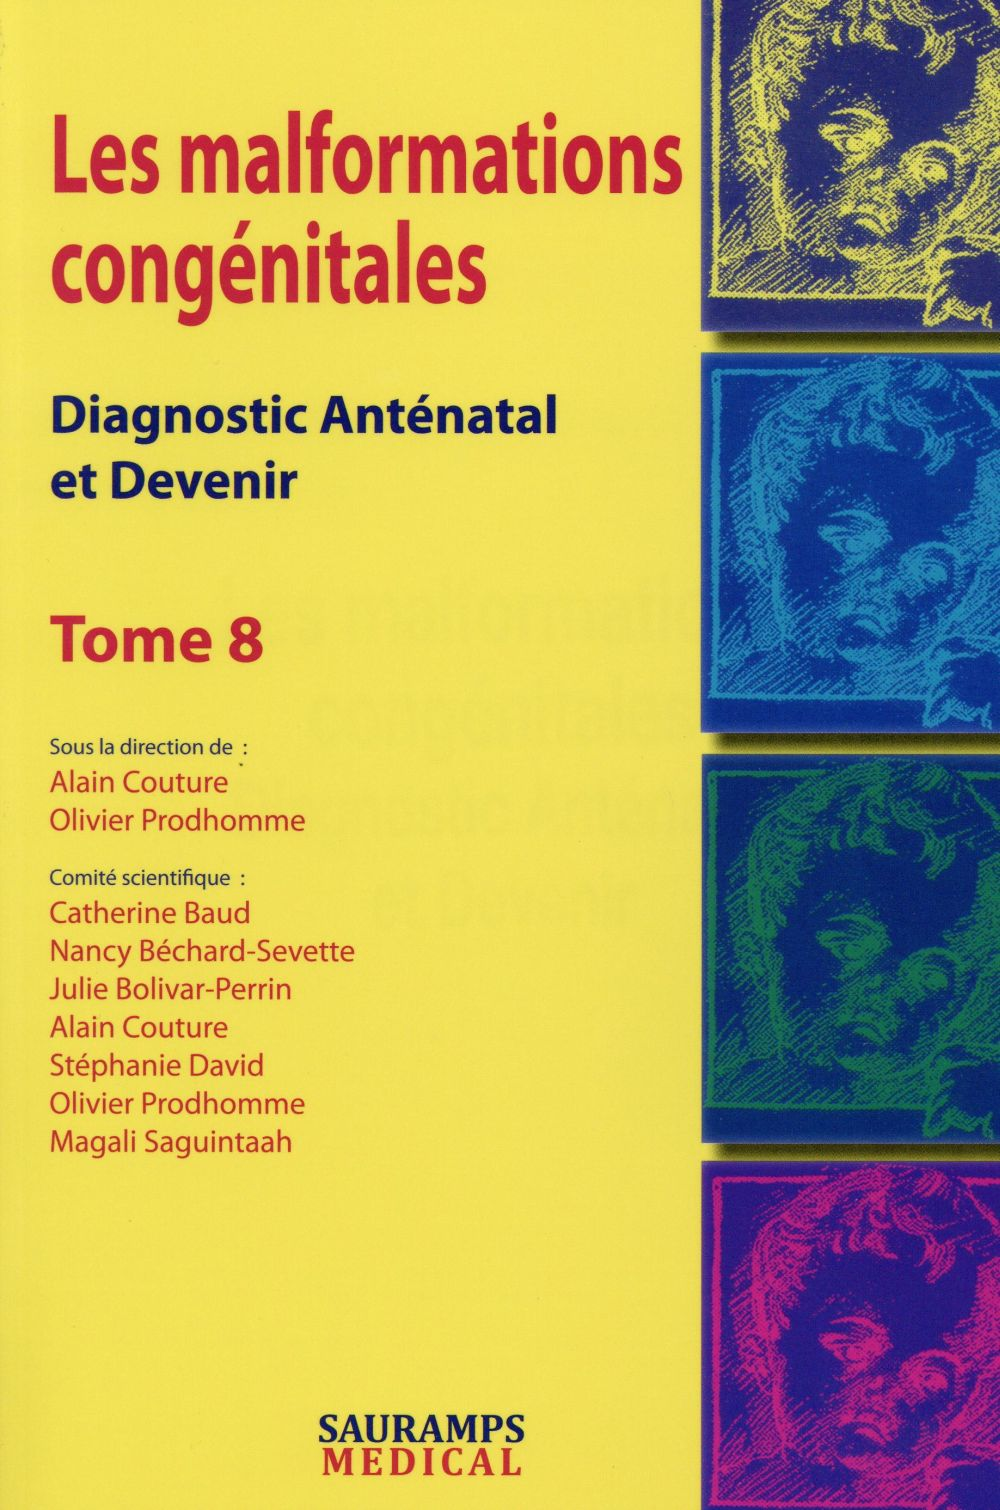 Les malformations congénitales ; diagnostic anténatal et devenir T.8